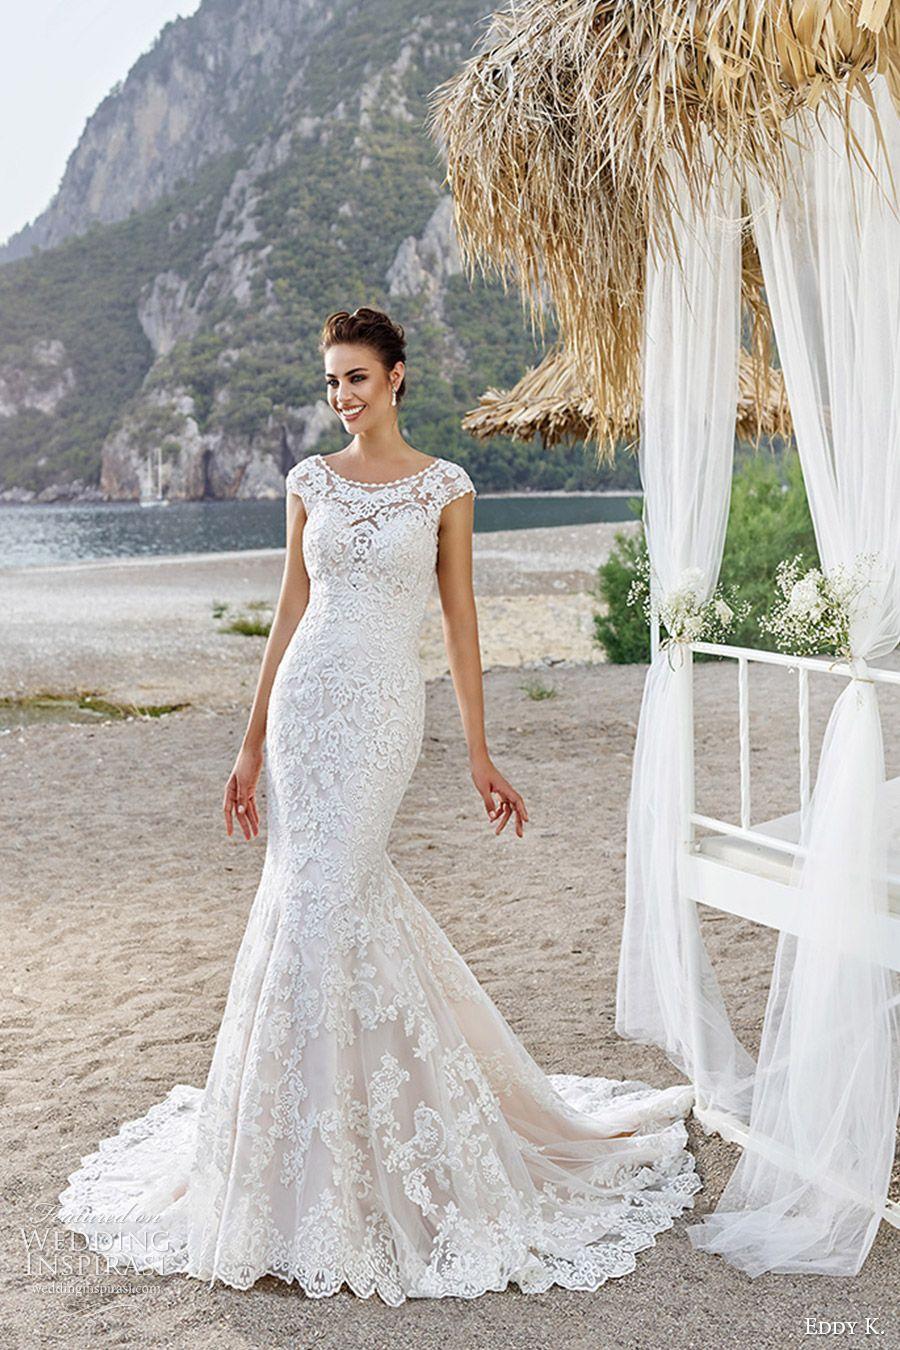 Eddy K Bridal Dreams Collection 2017 Lace Wedding Dress